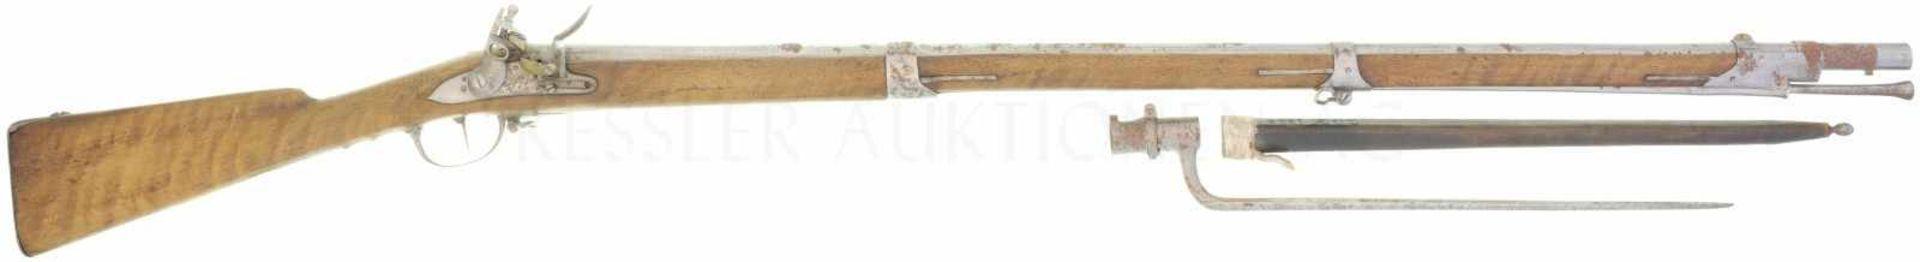 Steinschlossgew 1777 #806